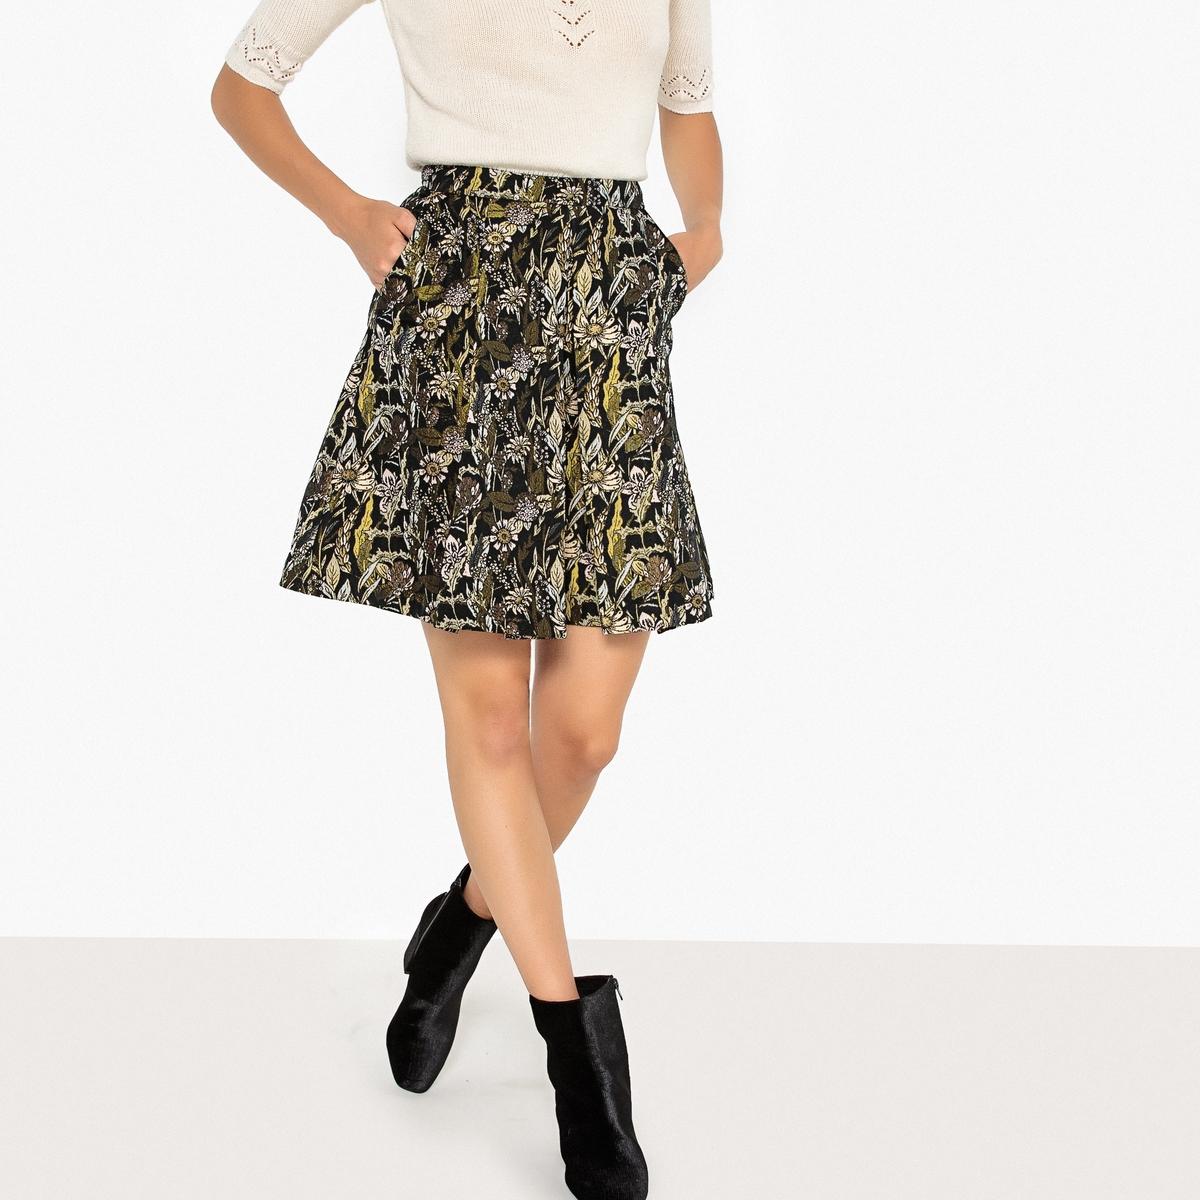 Falda de estilo patinadora jacquard, semilarga